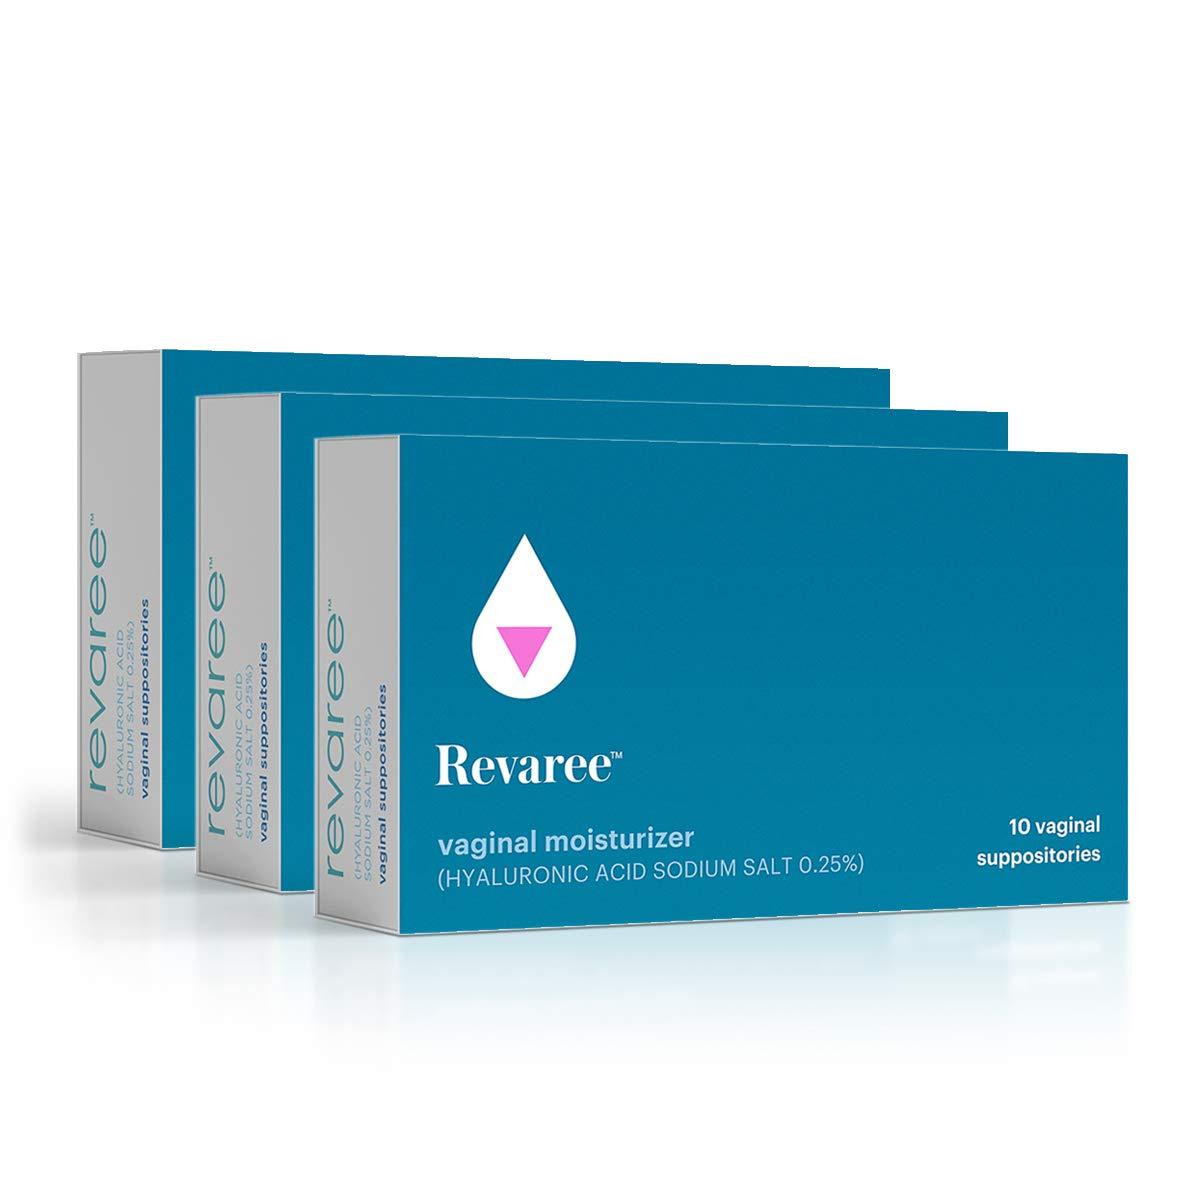 Bonafide - Revaree Hyaluronic Acid for Vaginal Dryness - Non-Hormonal, Paraben-Free (30 Vaginal Inserts) by Bonafide